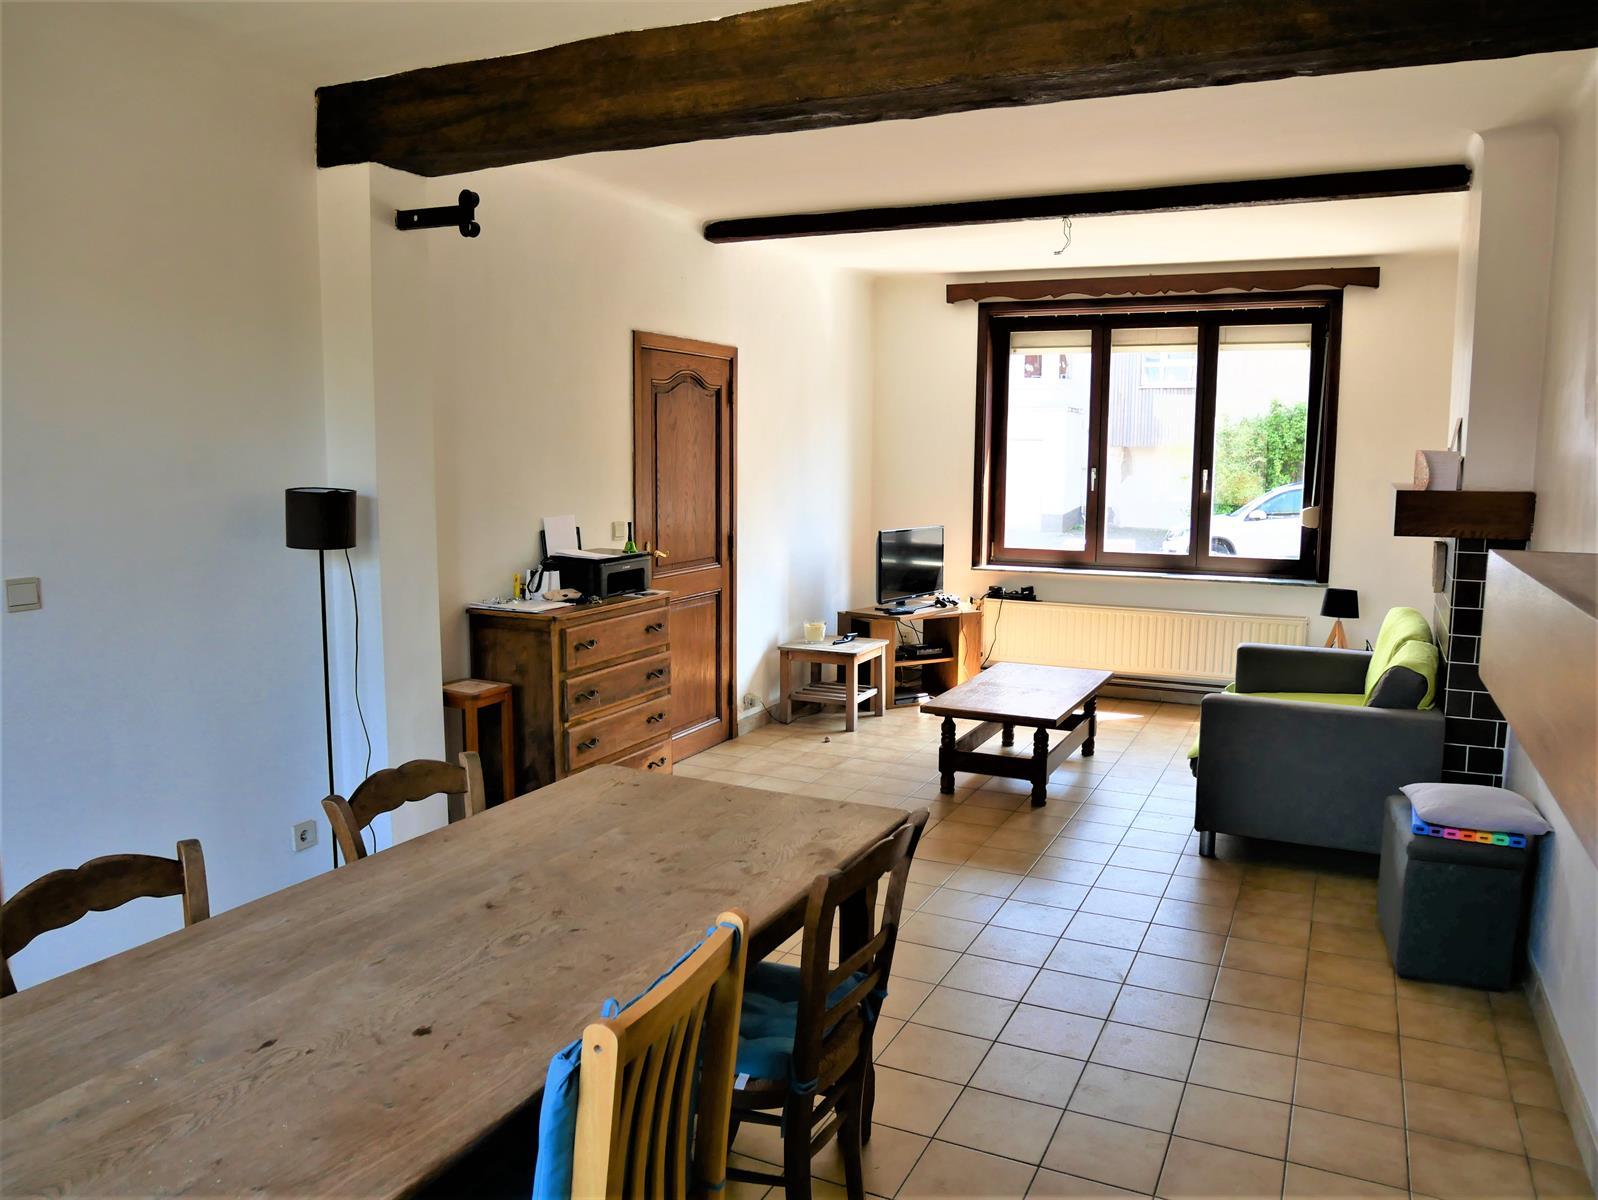 Maison - Ottignies-Louvain-la-Neuve - #4345933-1